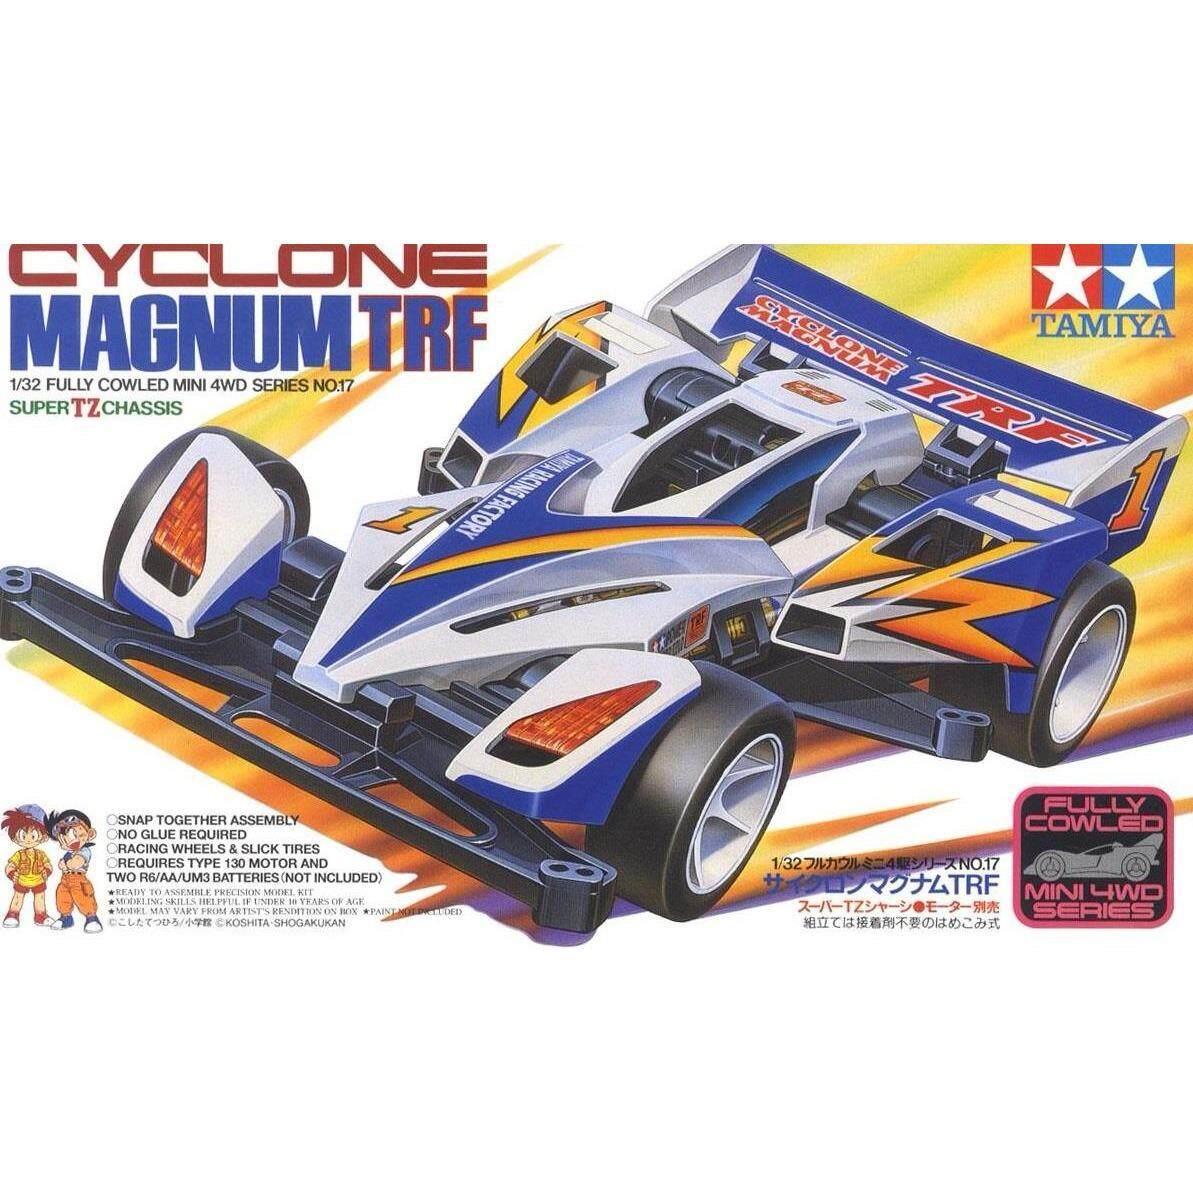 1/32 TAMIYA Cyclone Magnum TRF Super TZ Chassis